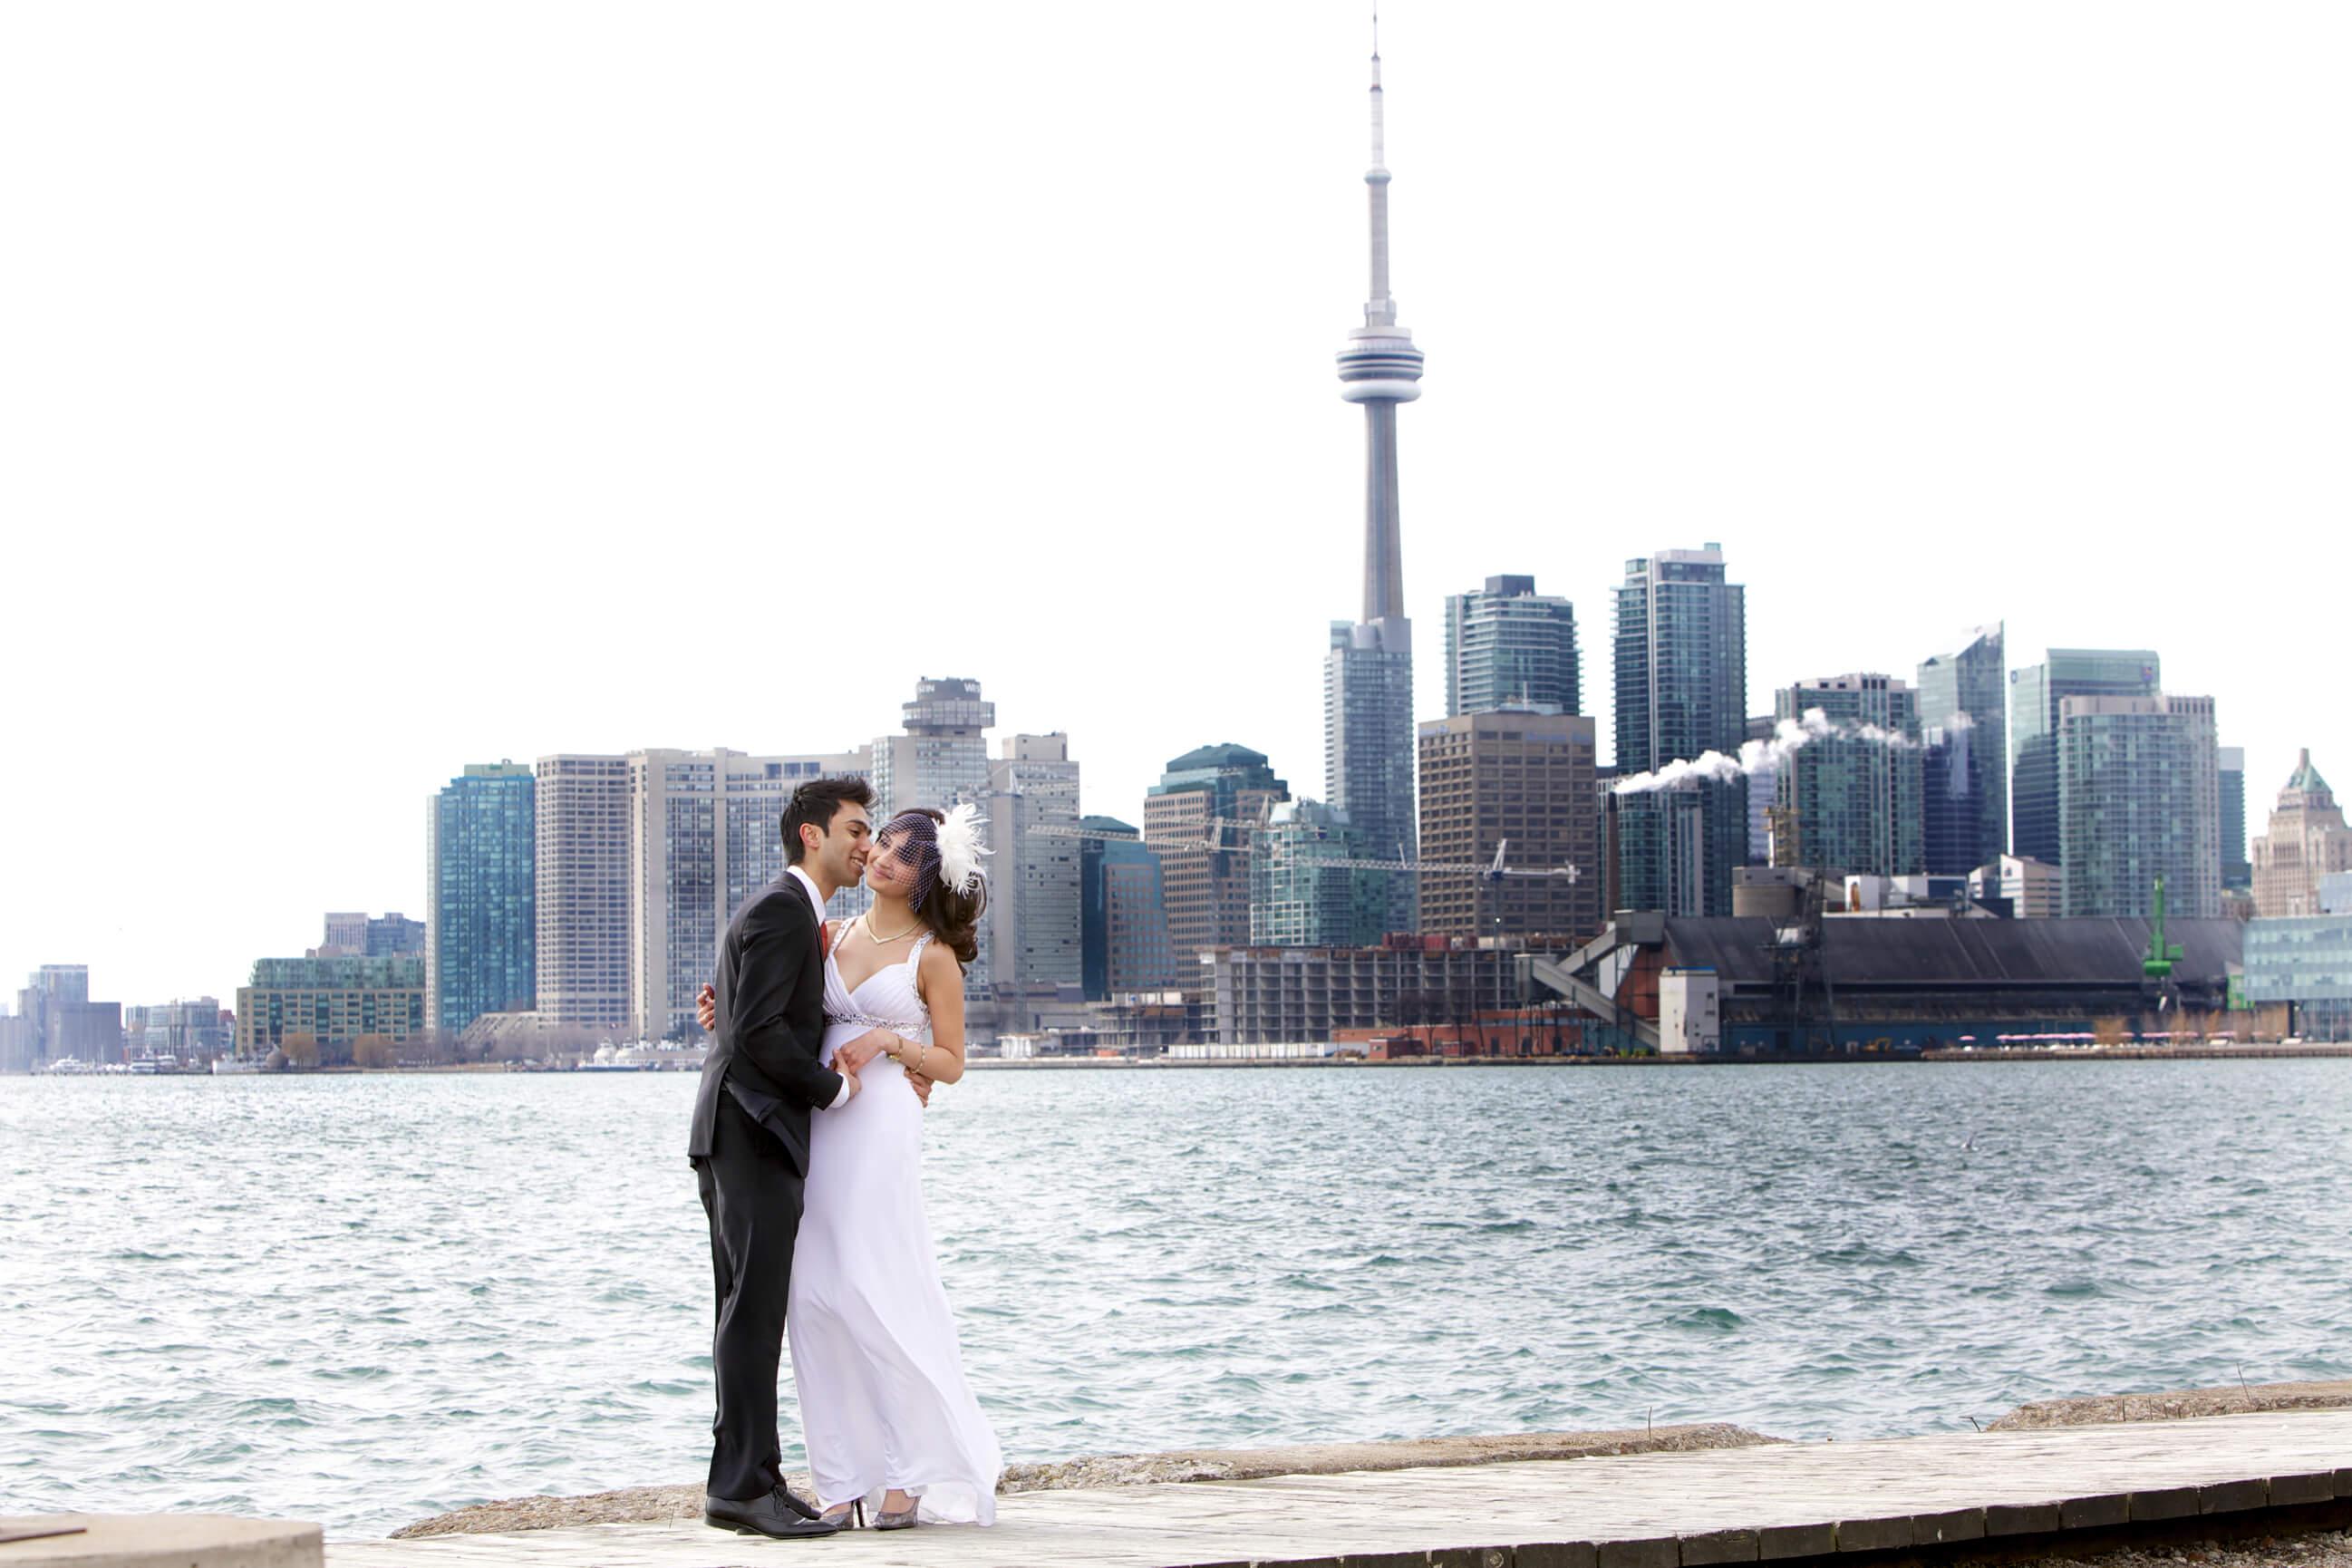 Affordable Wedding Photographer Toronto | Imagine Studios